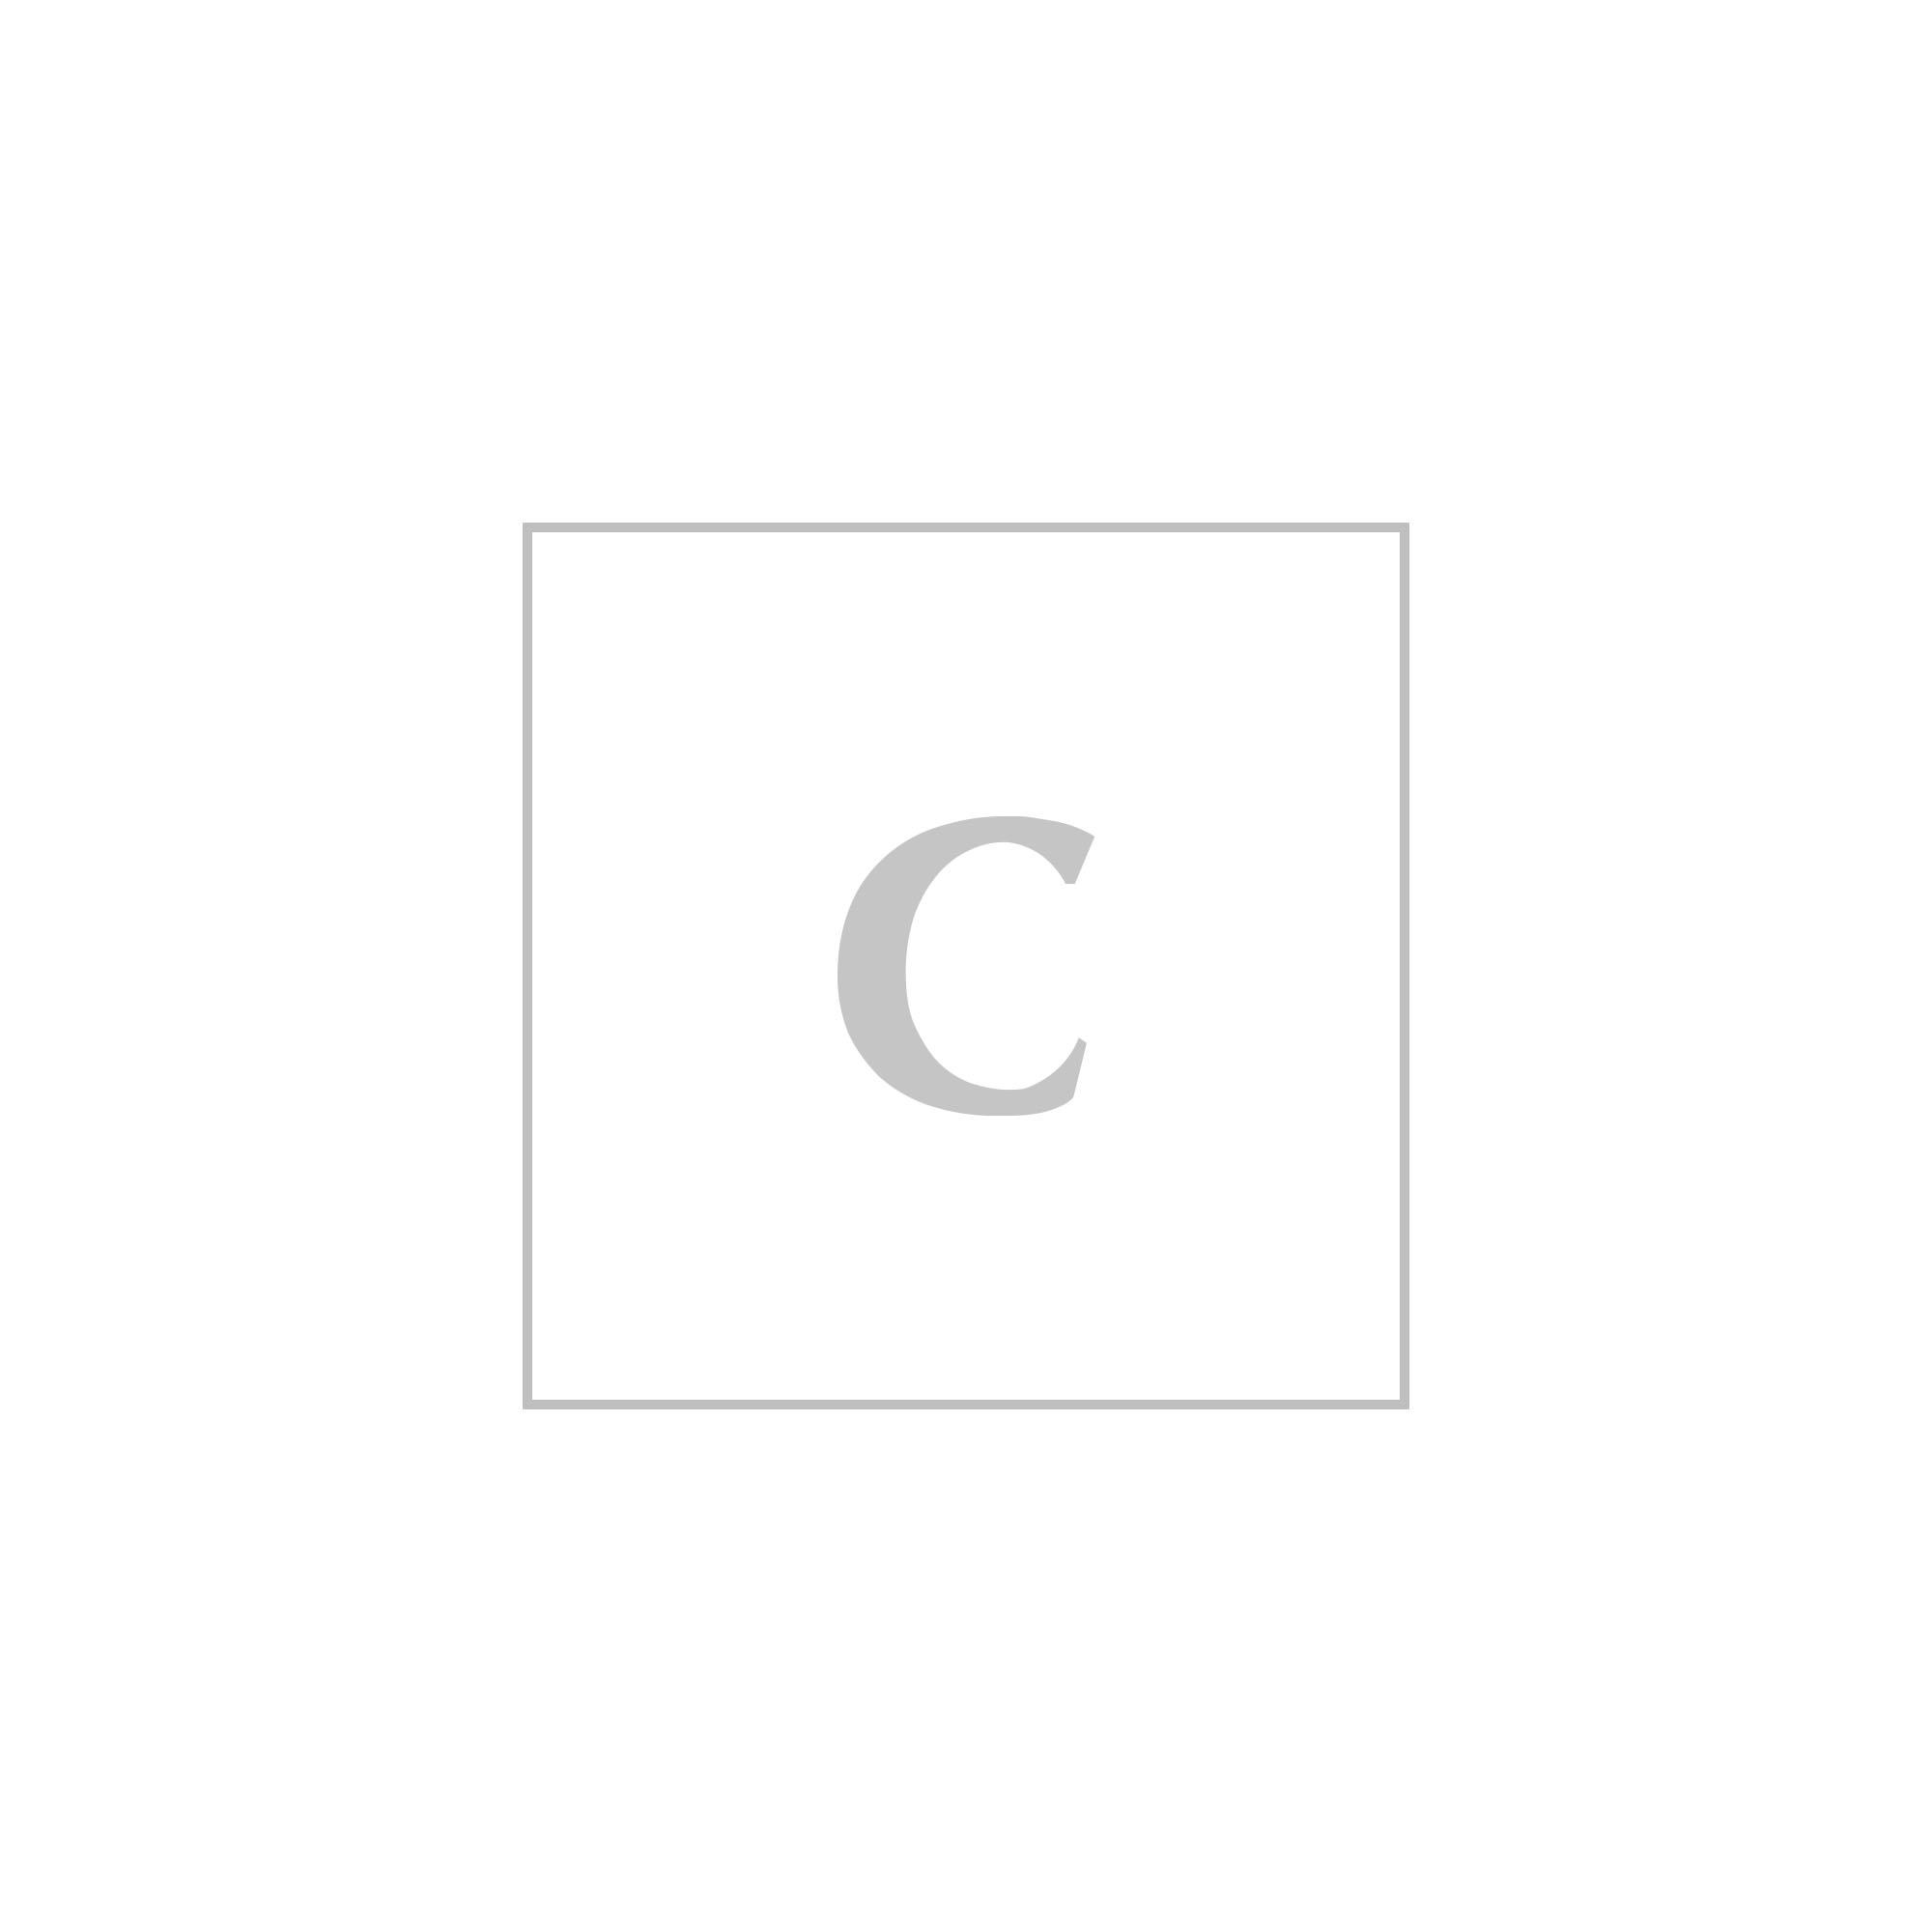 Christian Dior borsa lady dior md bicolor cannage